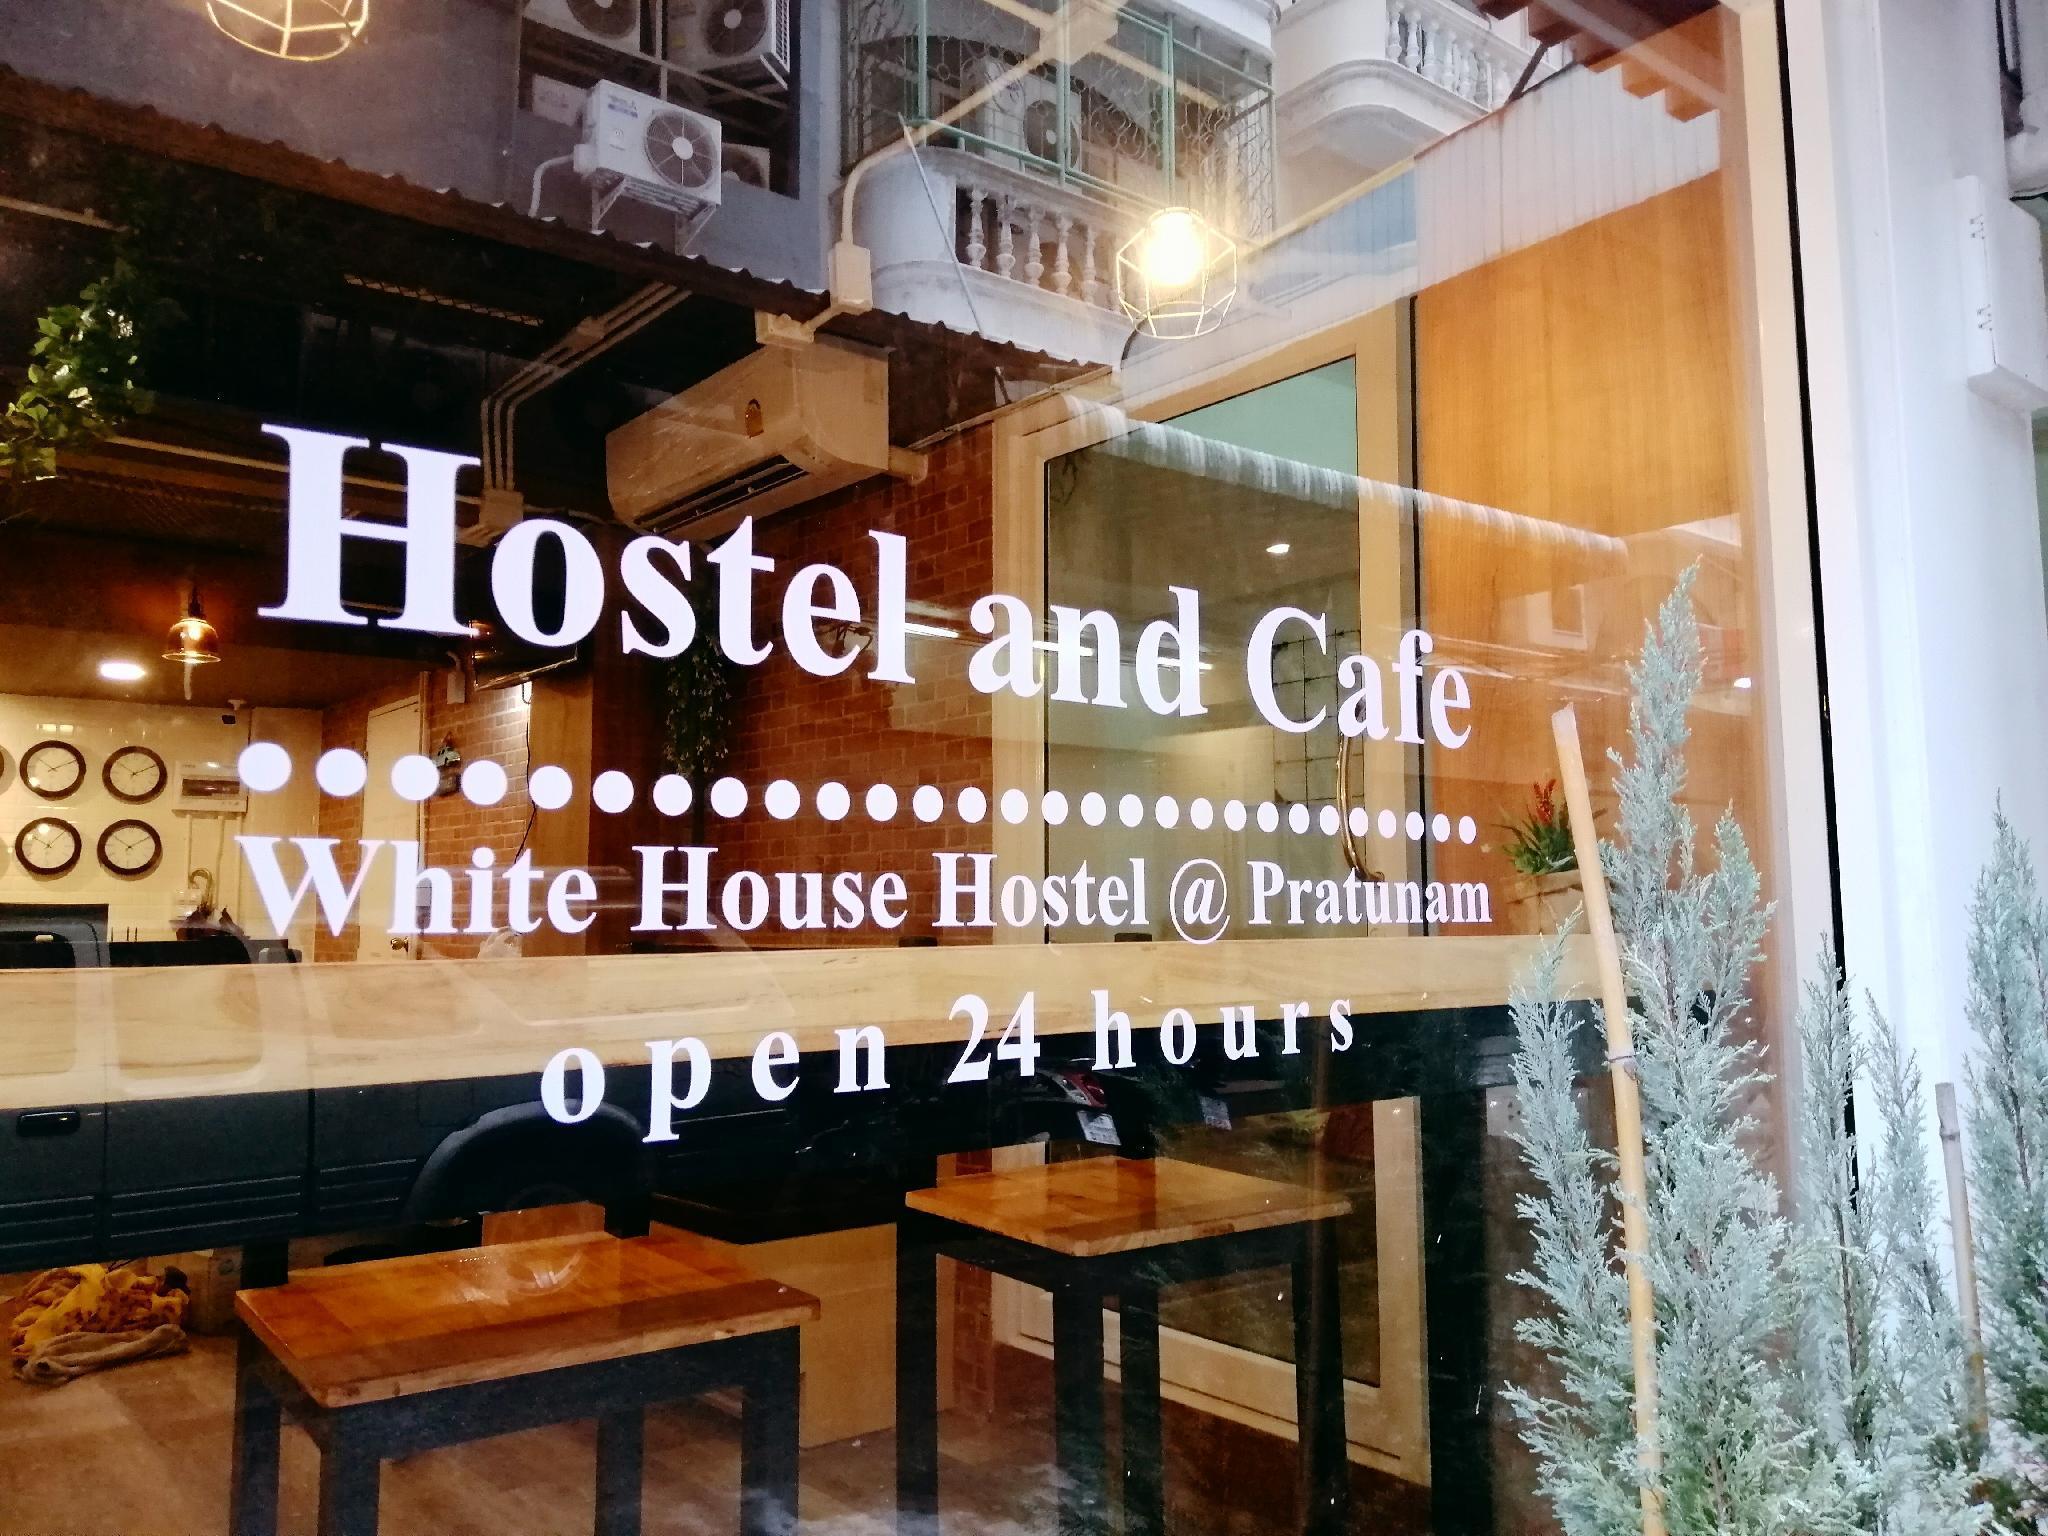 White House Hostel ไวท์เฮาส์ โฮสเทล